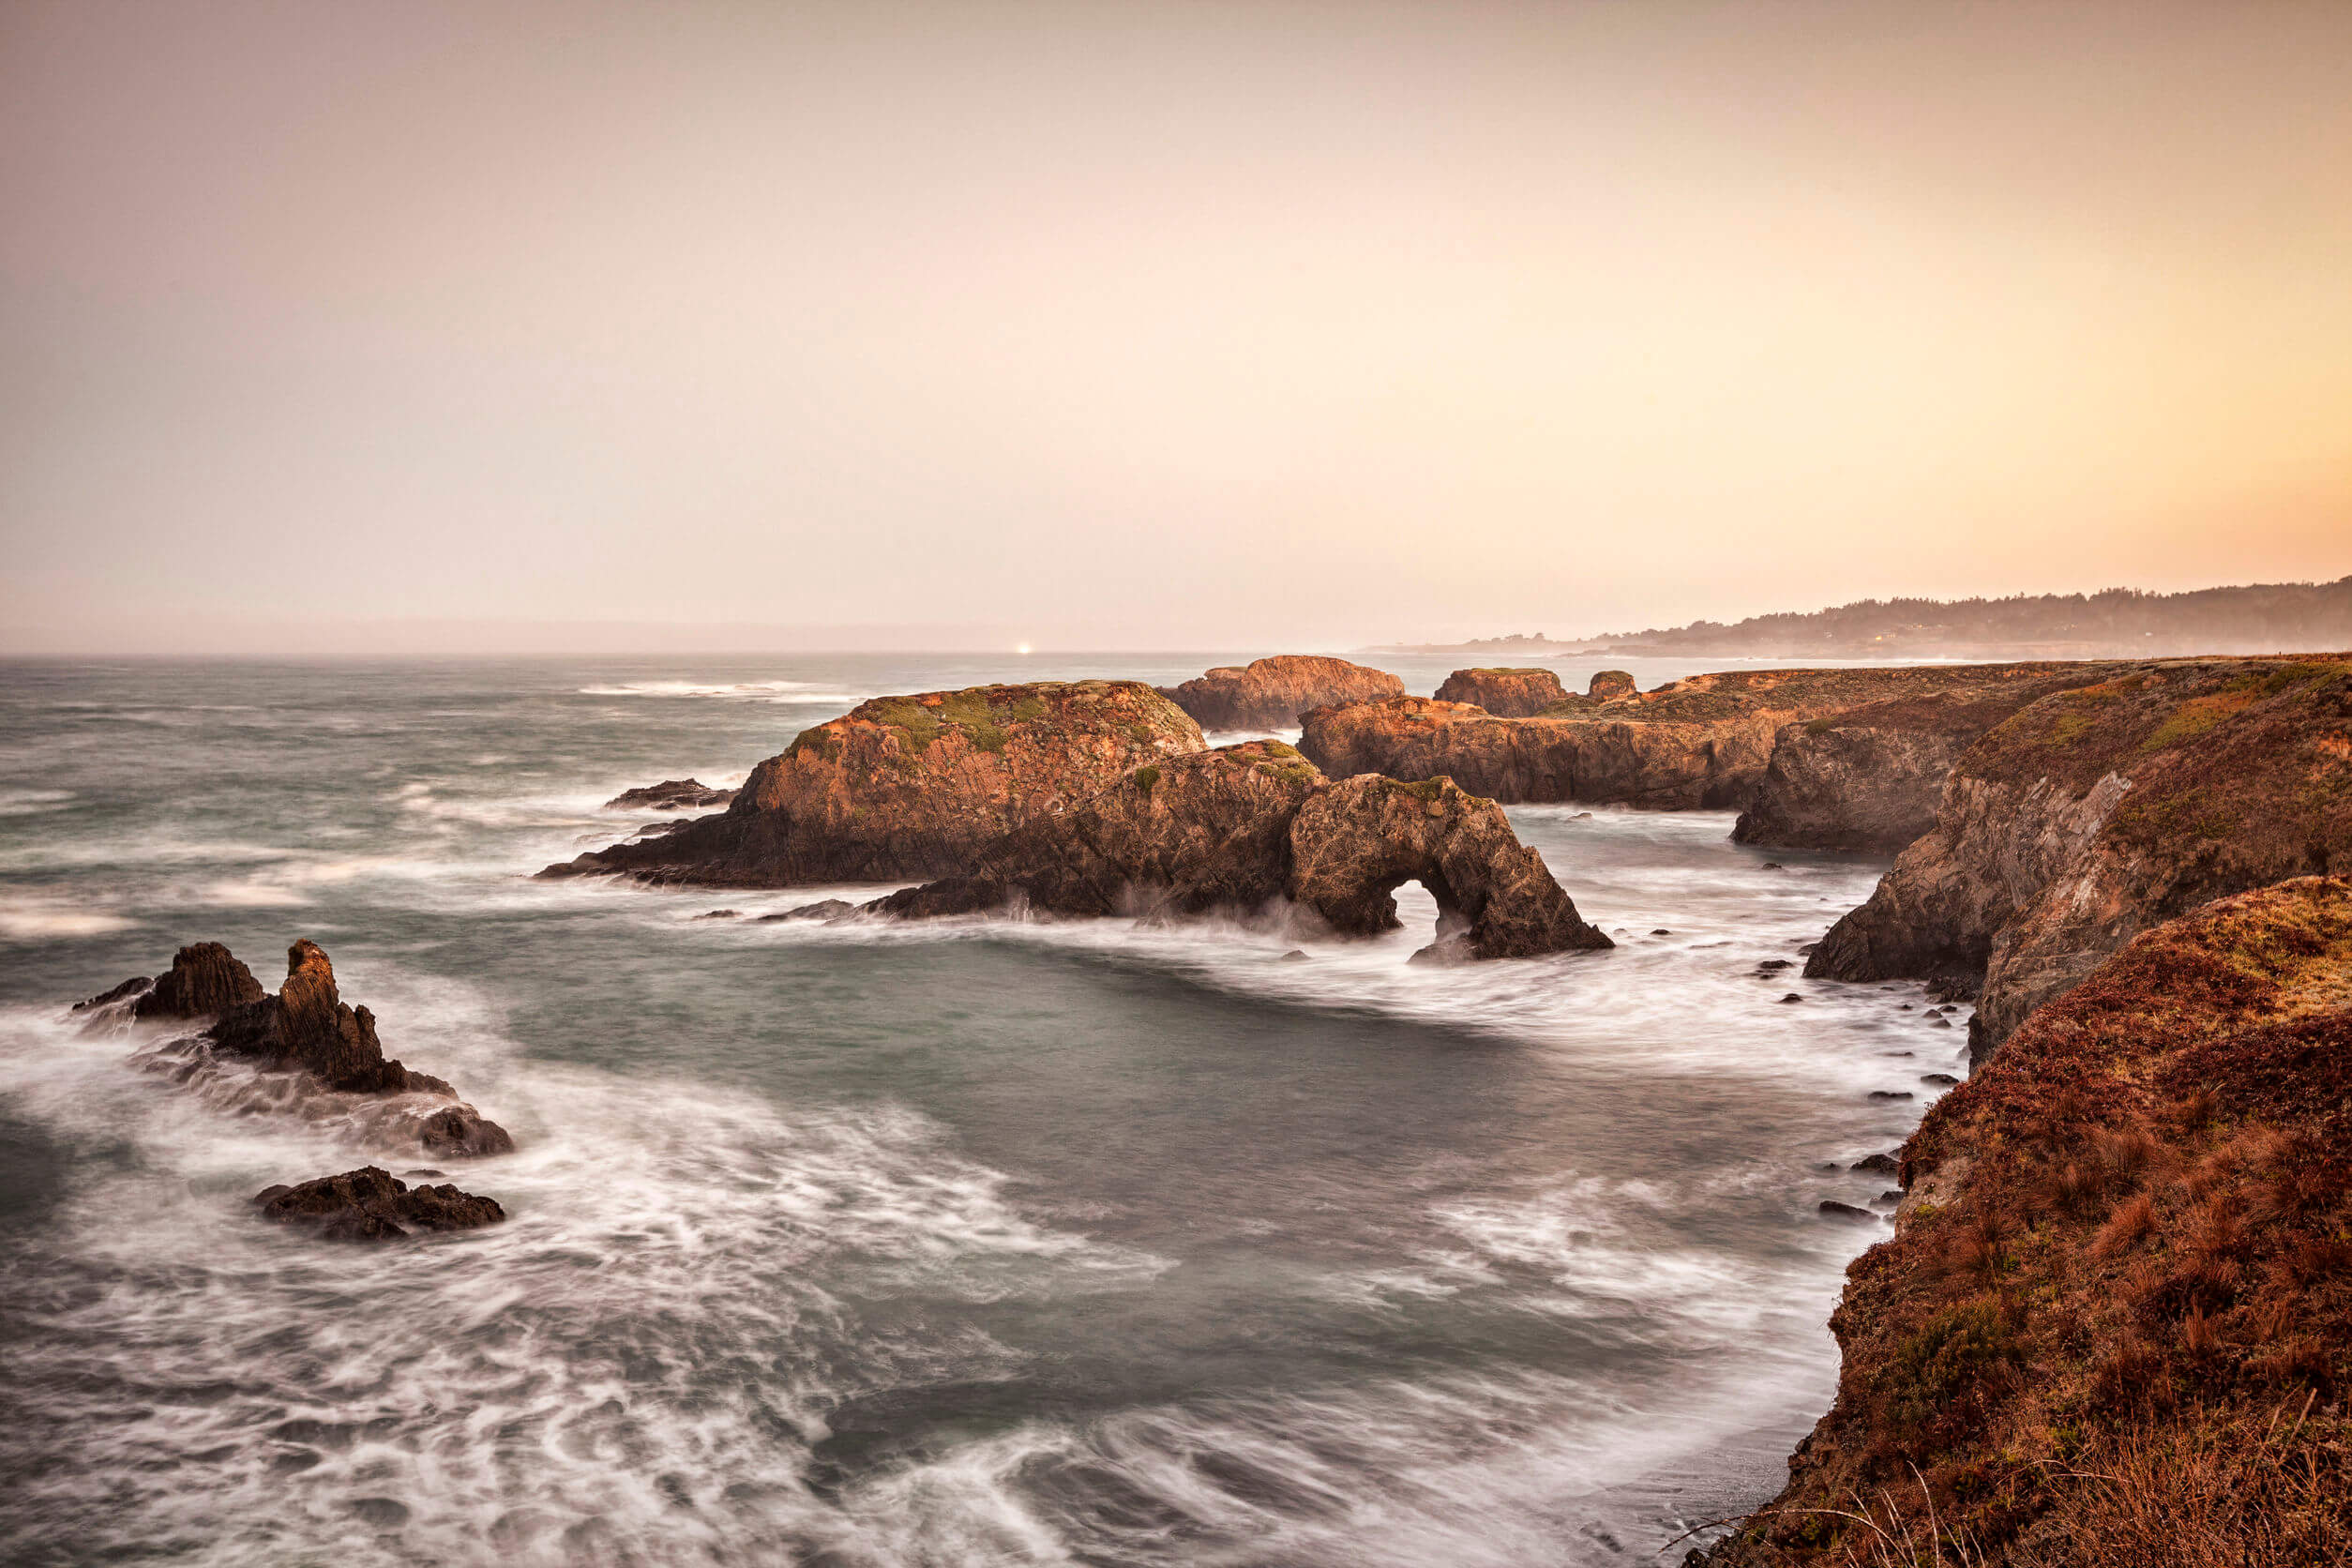 Mendocino Headlands, California at dawn, looking over the ocean.